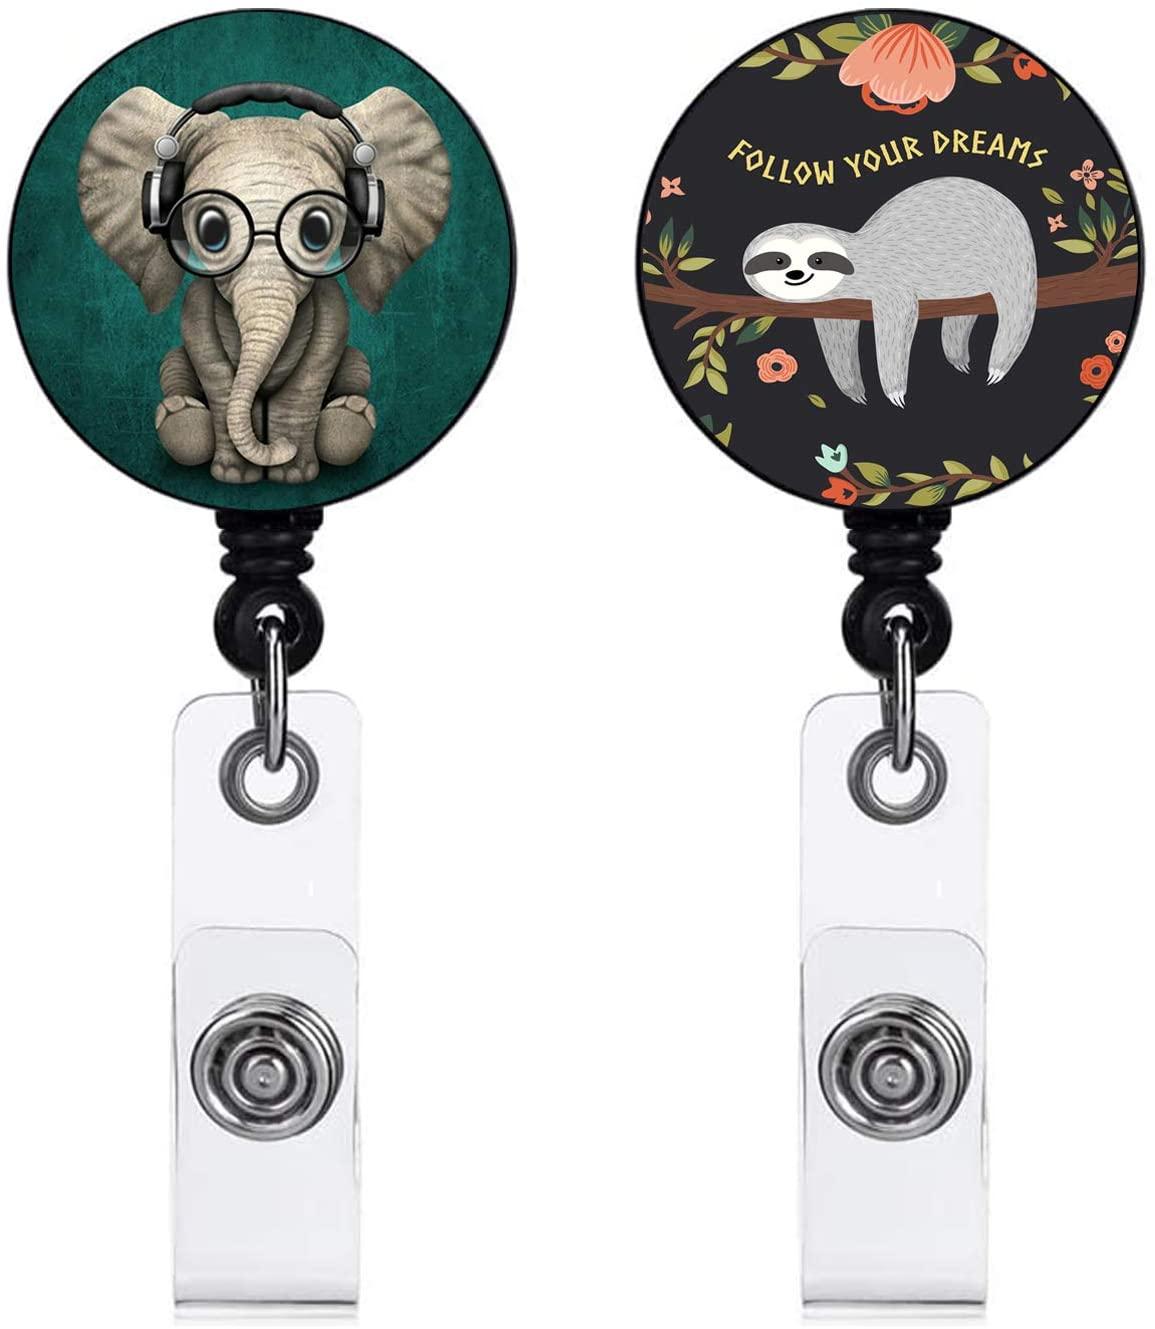 Nurse Badge Holder Reel Clip Retractable ID Card Name Badge Reel Holder 24 inch Sloth & Elephant